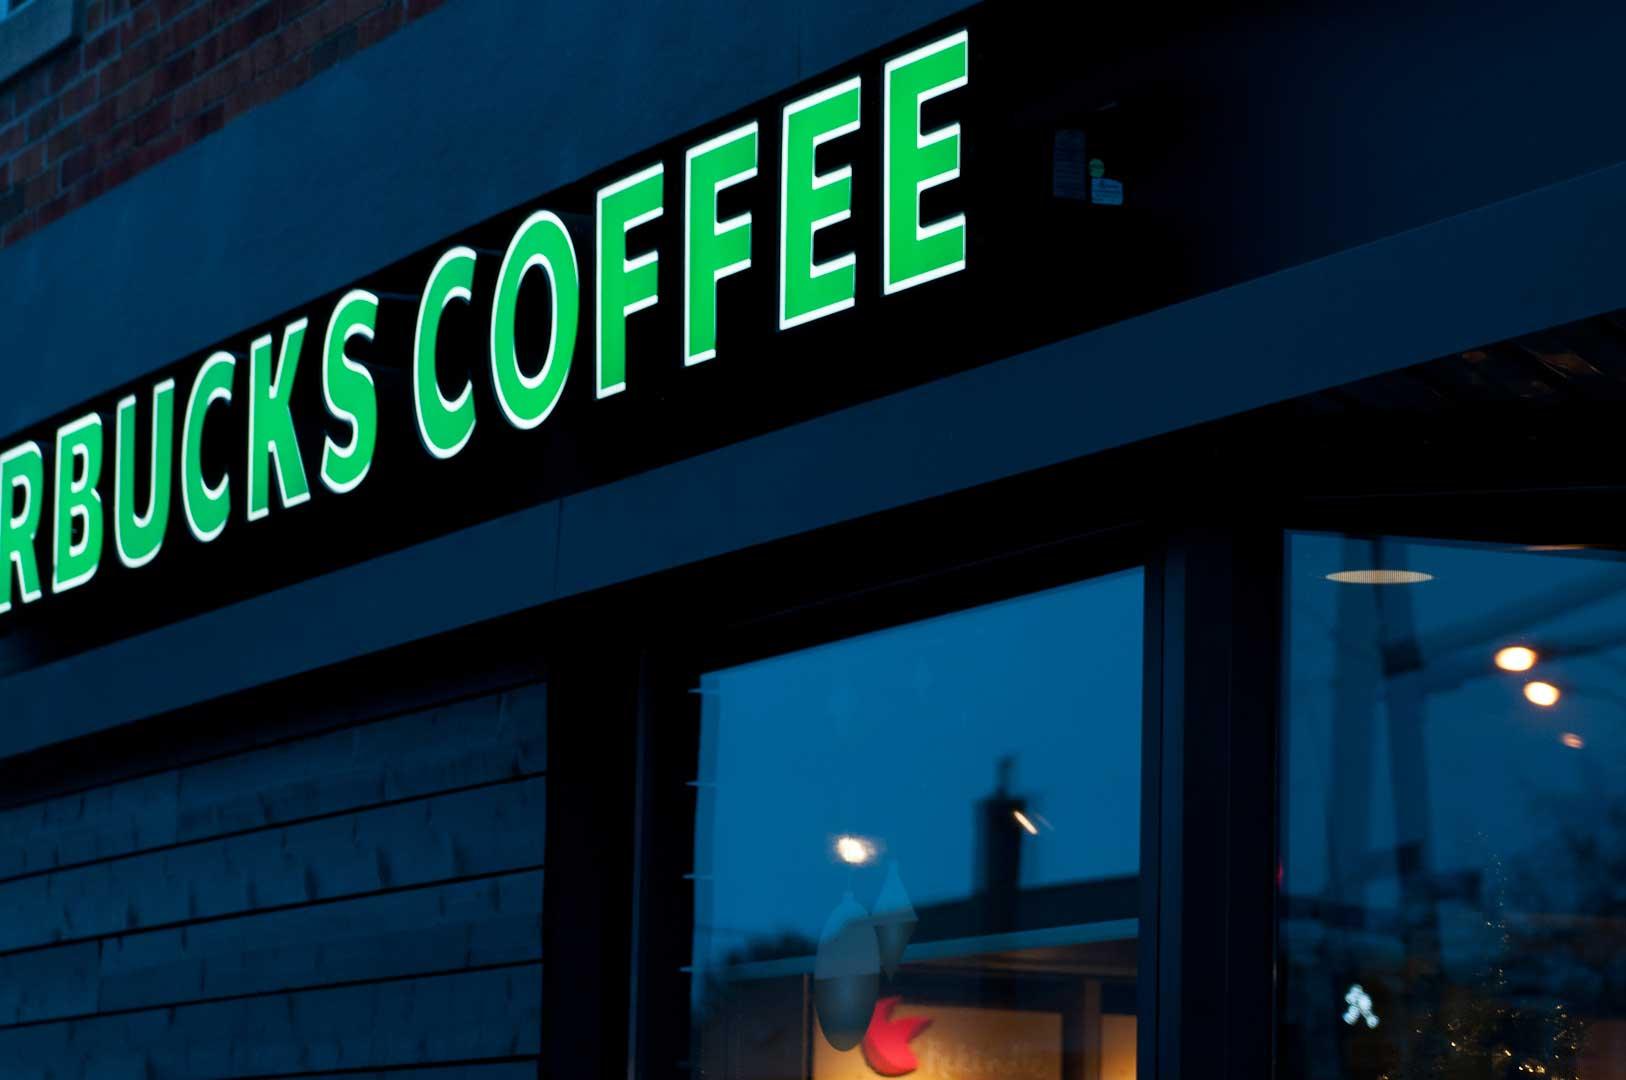 Dark Starbucks Sign Showing Metal Work by Explore1.ca